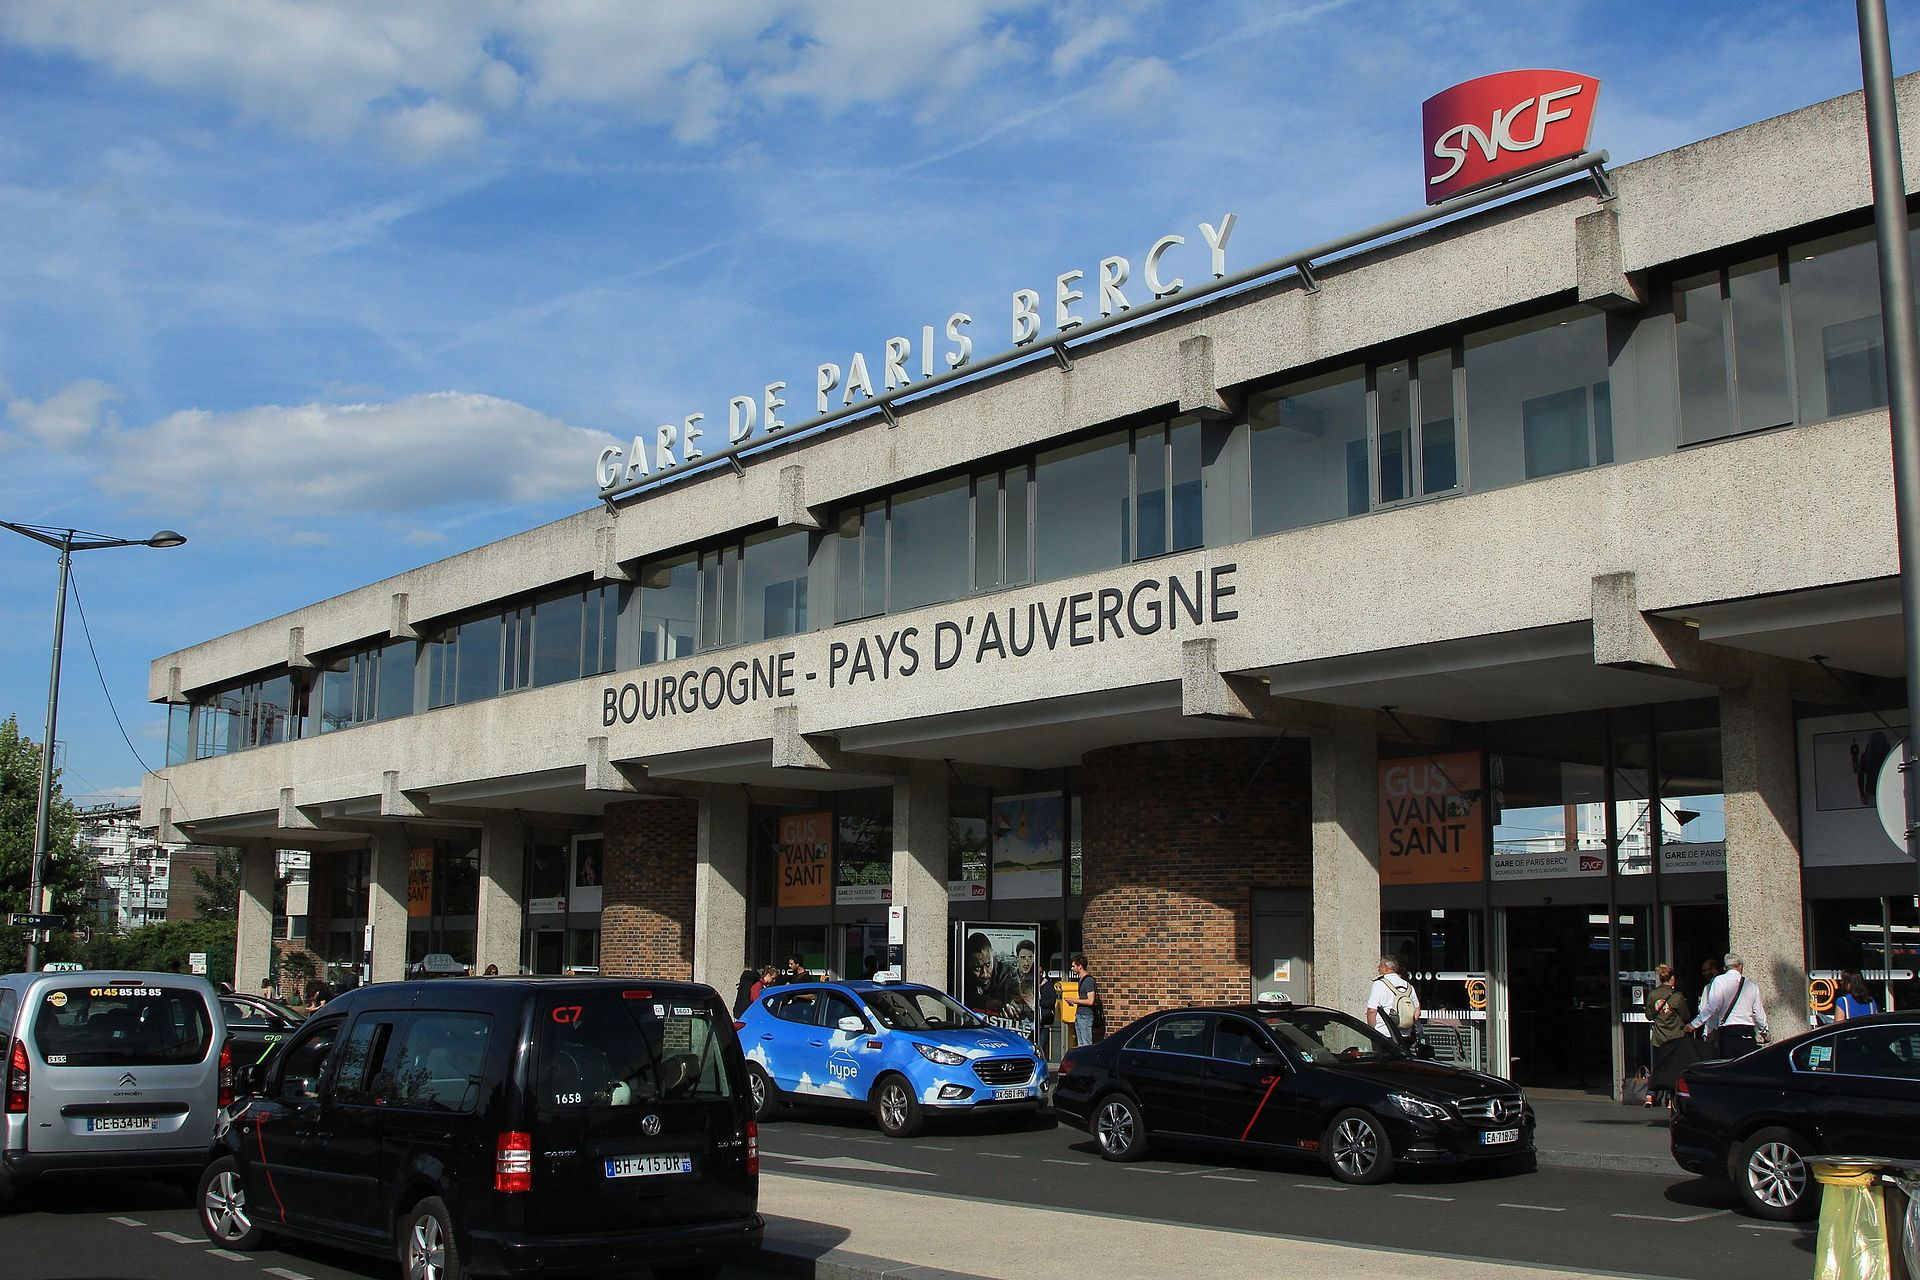 Gare de paris bercy bourgogne pays d 39 auvergne wikip dia for Garage de la gare bretigny